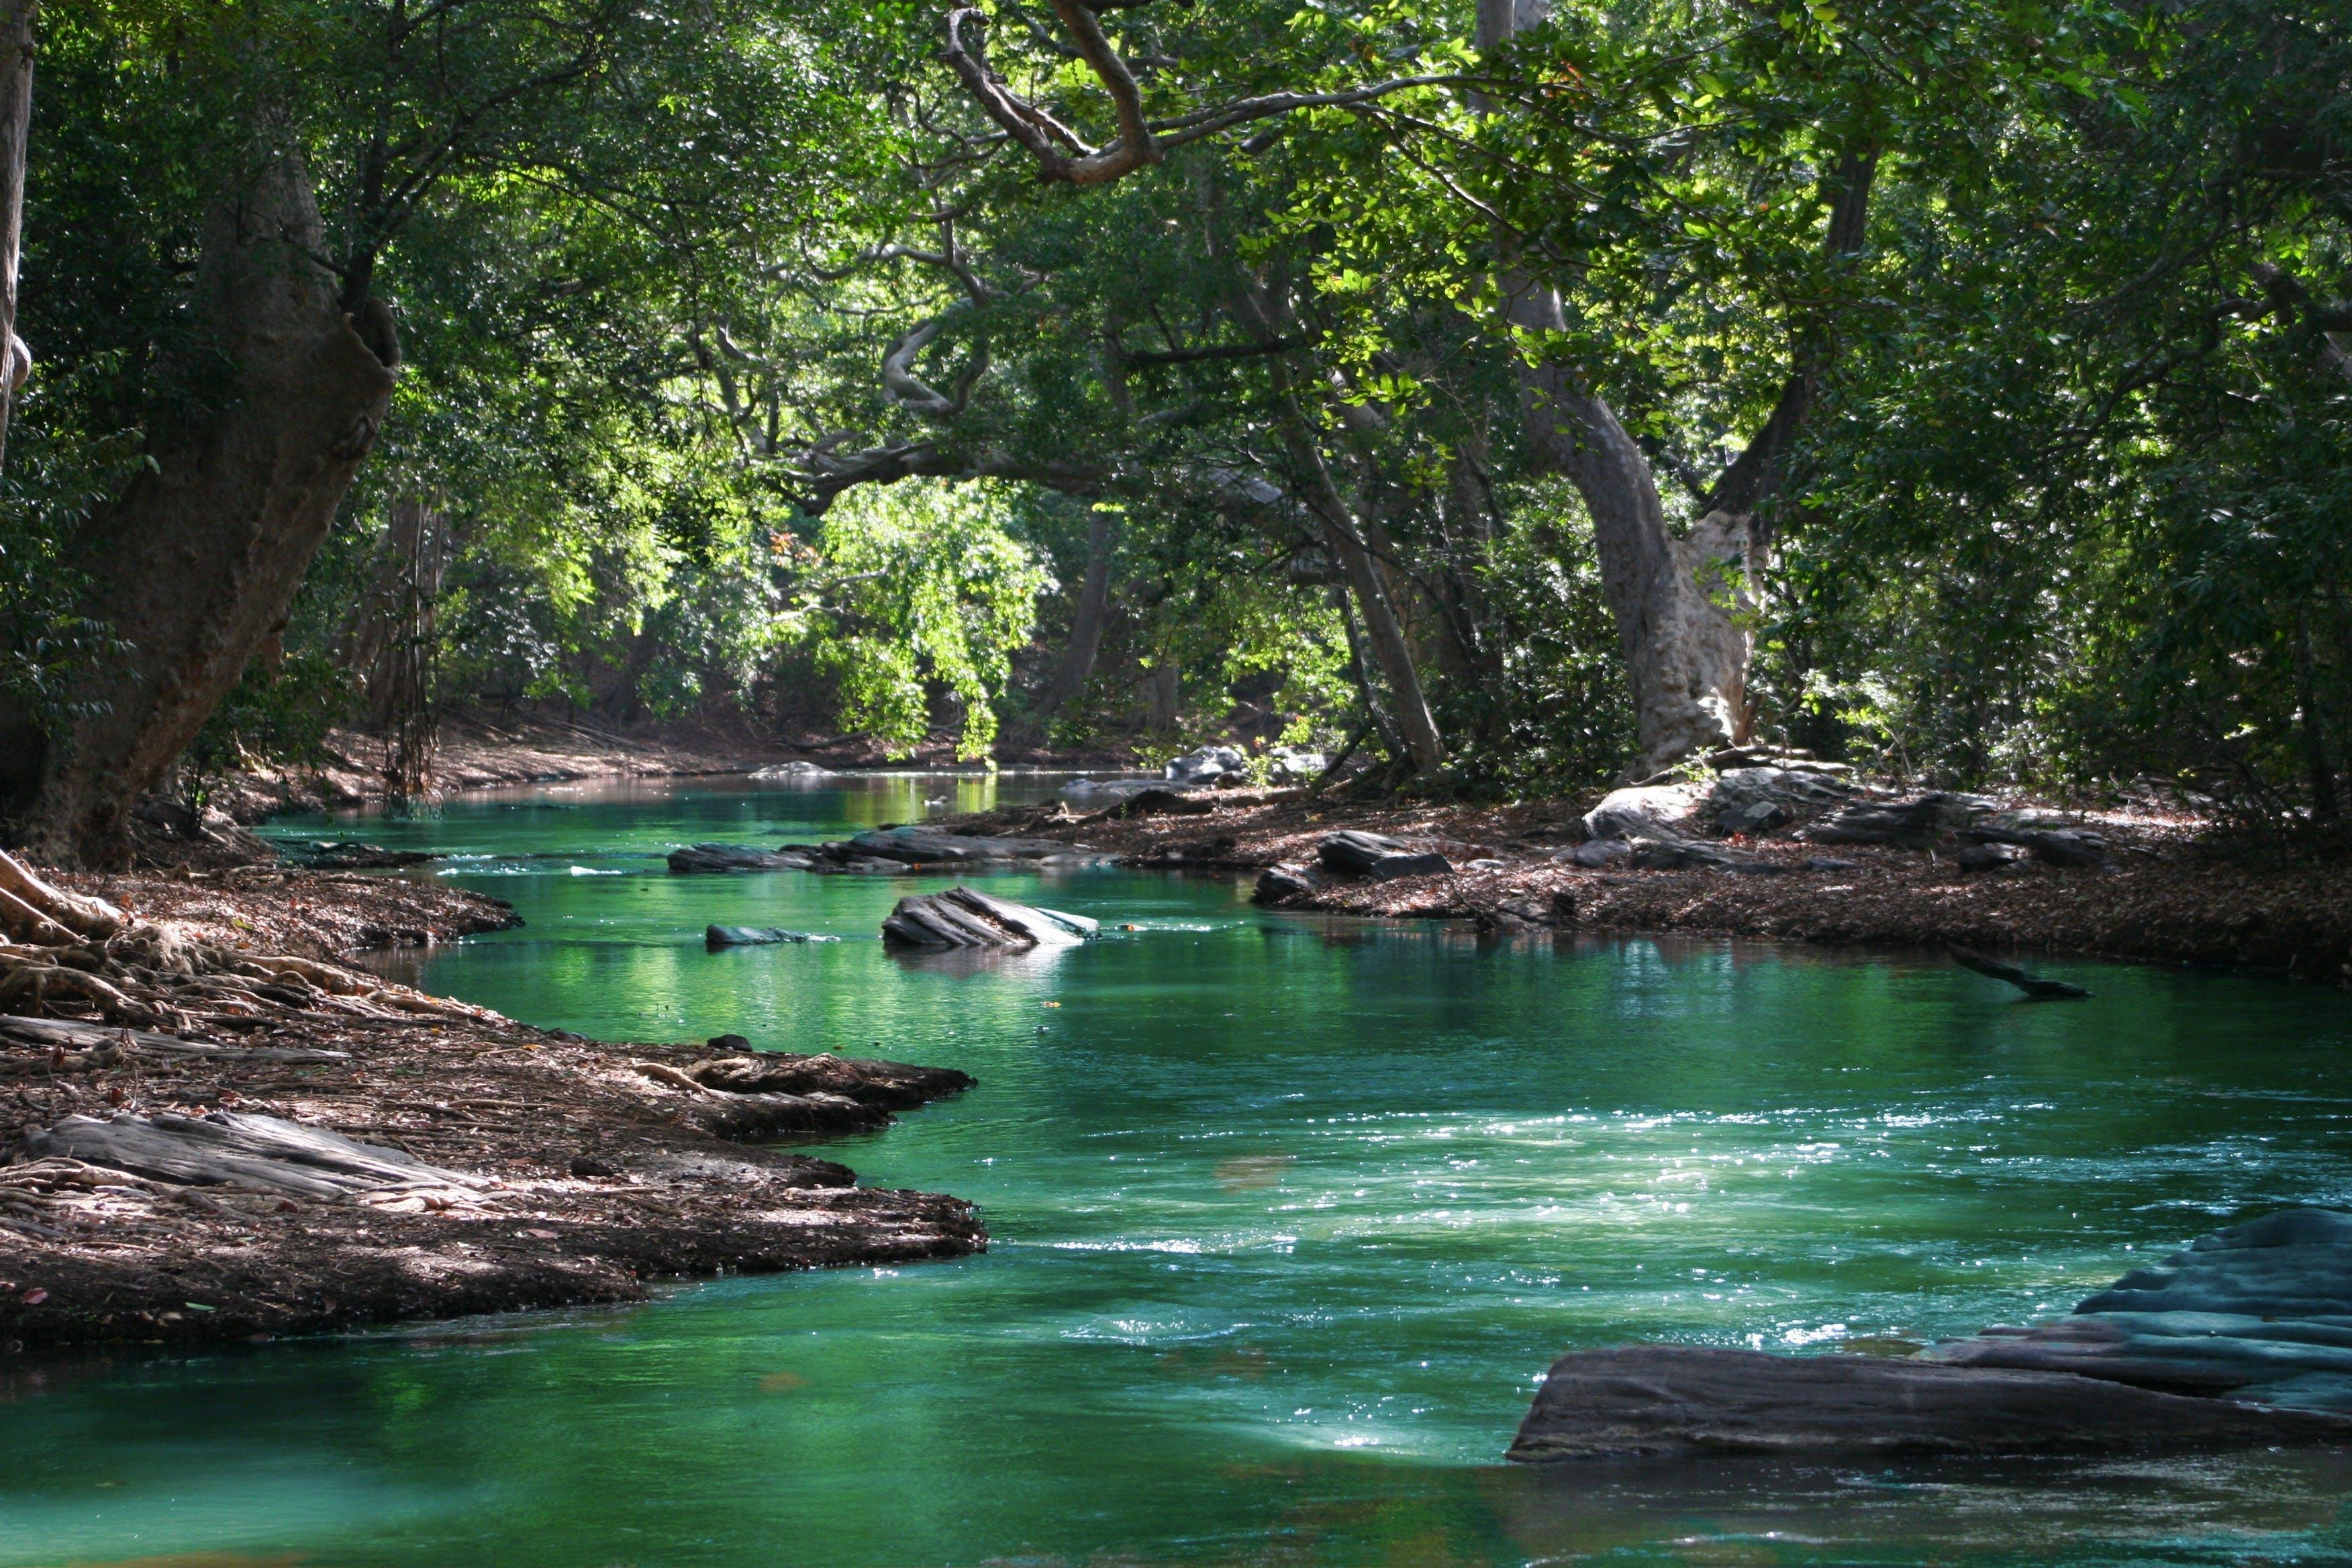 Fotos de stock gratuitas de agua, arboles, bonito, caudal